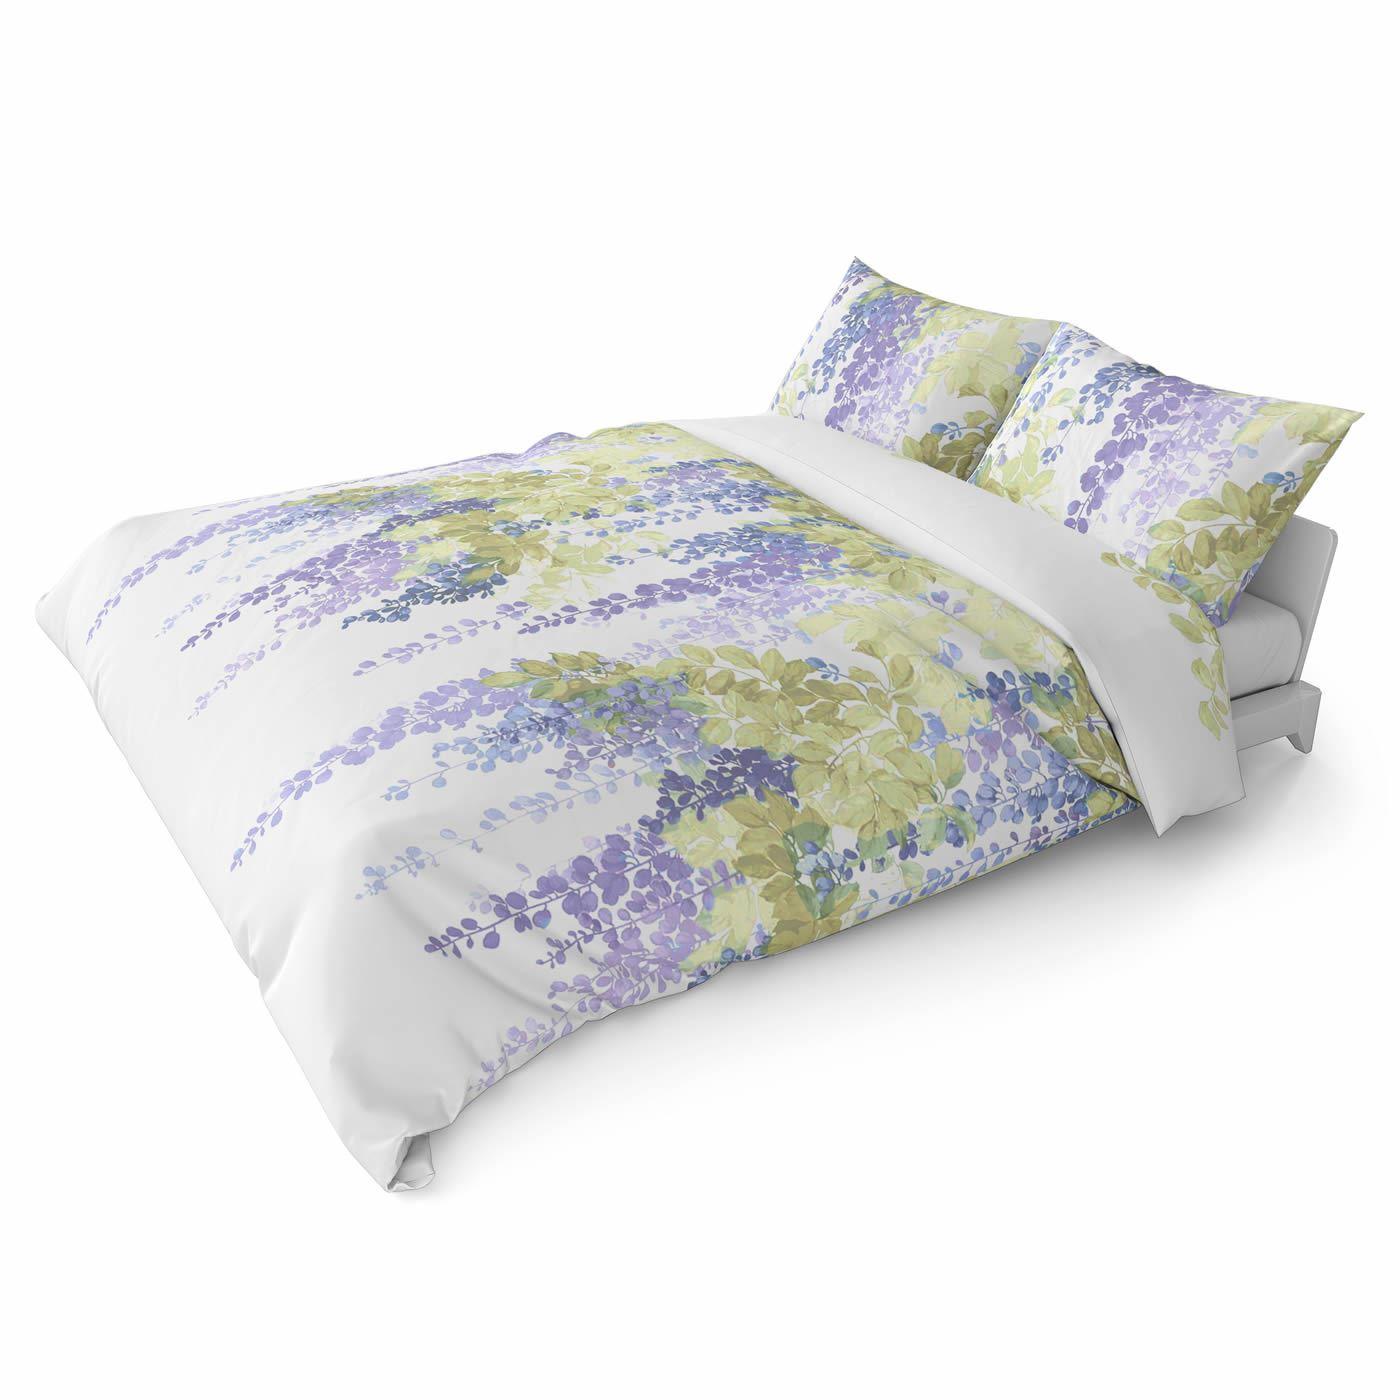 Funda-nordica-azul-azul-marino-verde-azulado-edredon-algodon-estampado-juego-conjuntos-de-cama-cubre miniatura 26